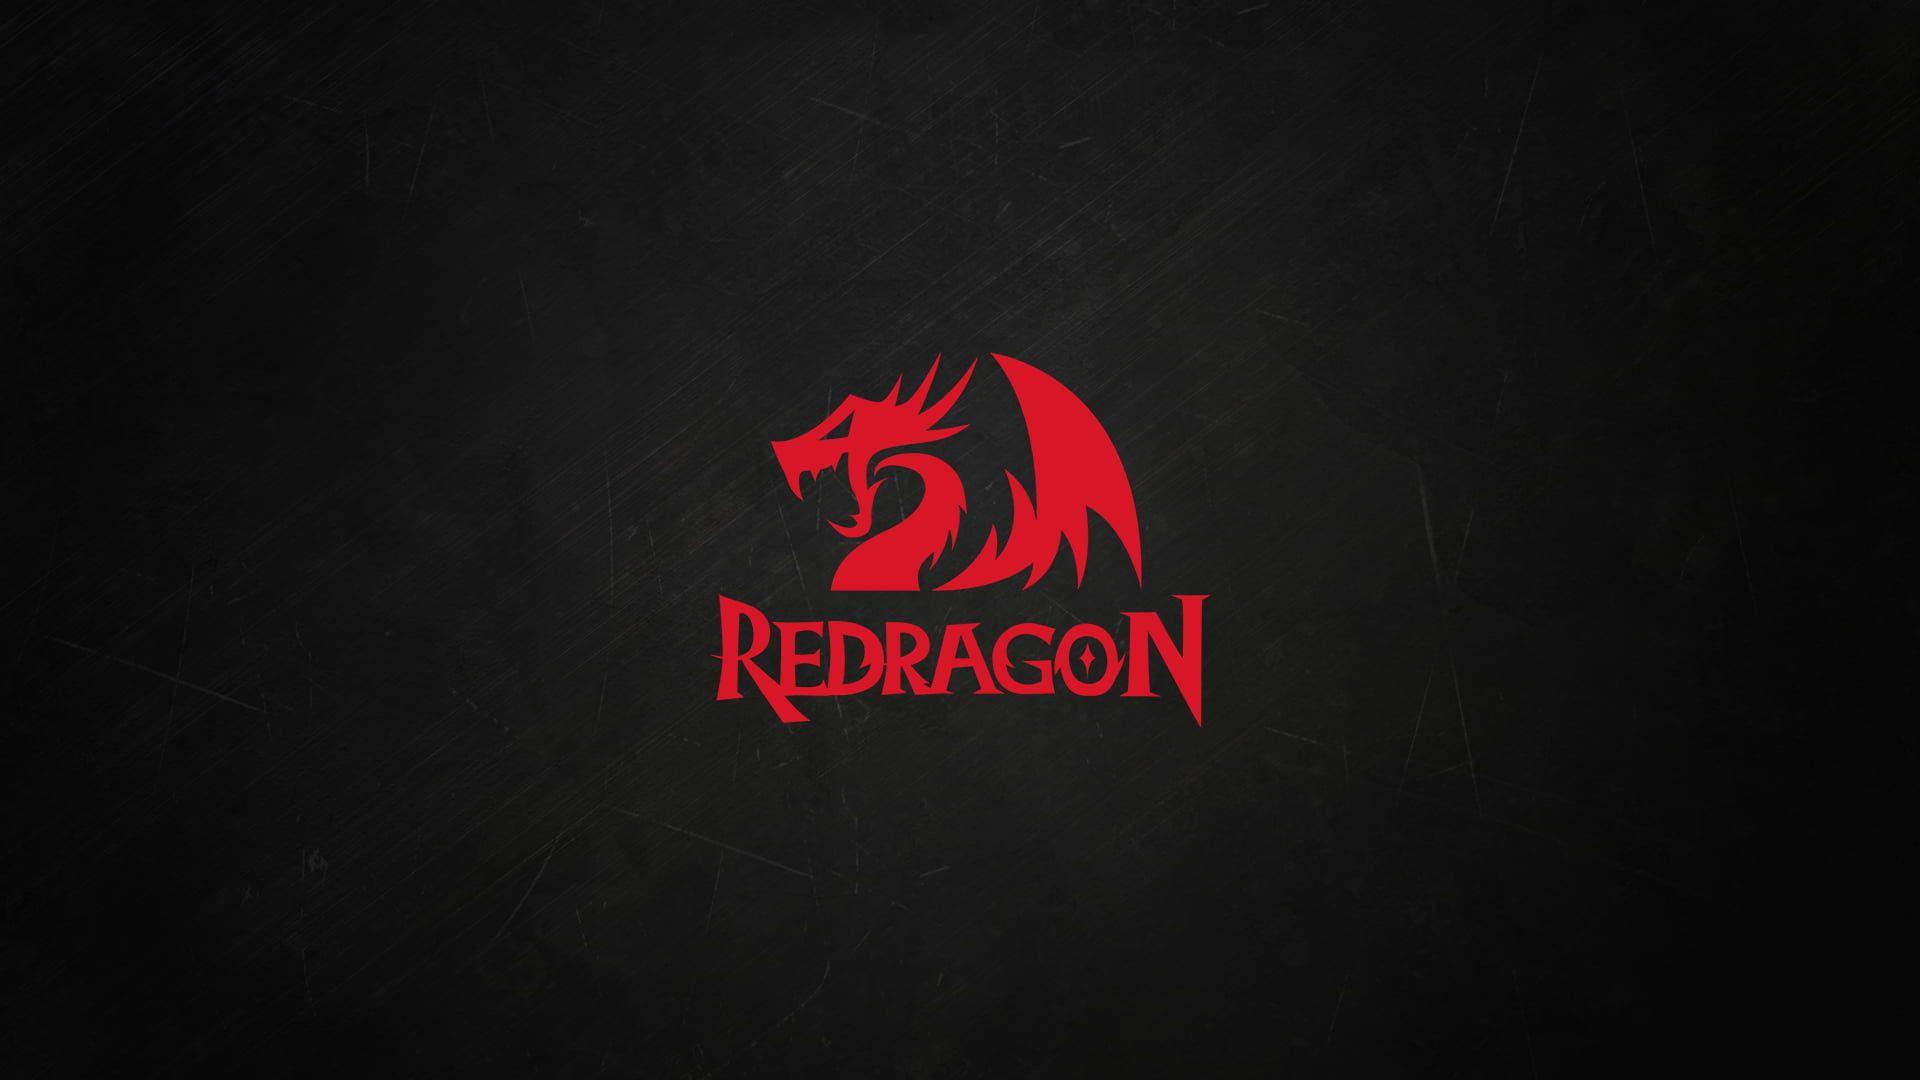 Redragon Pc Gaming 1080p Wallpaper Hdwallpaper Desktop In 2021 Gaming Wallpapers Wallpaper Pc Red Dragon